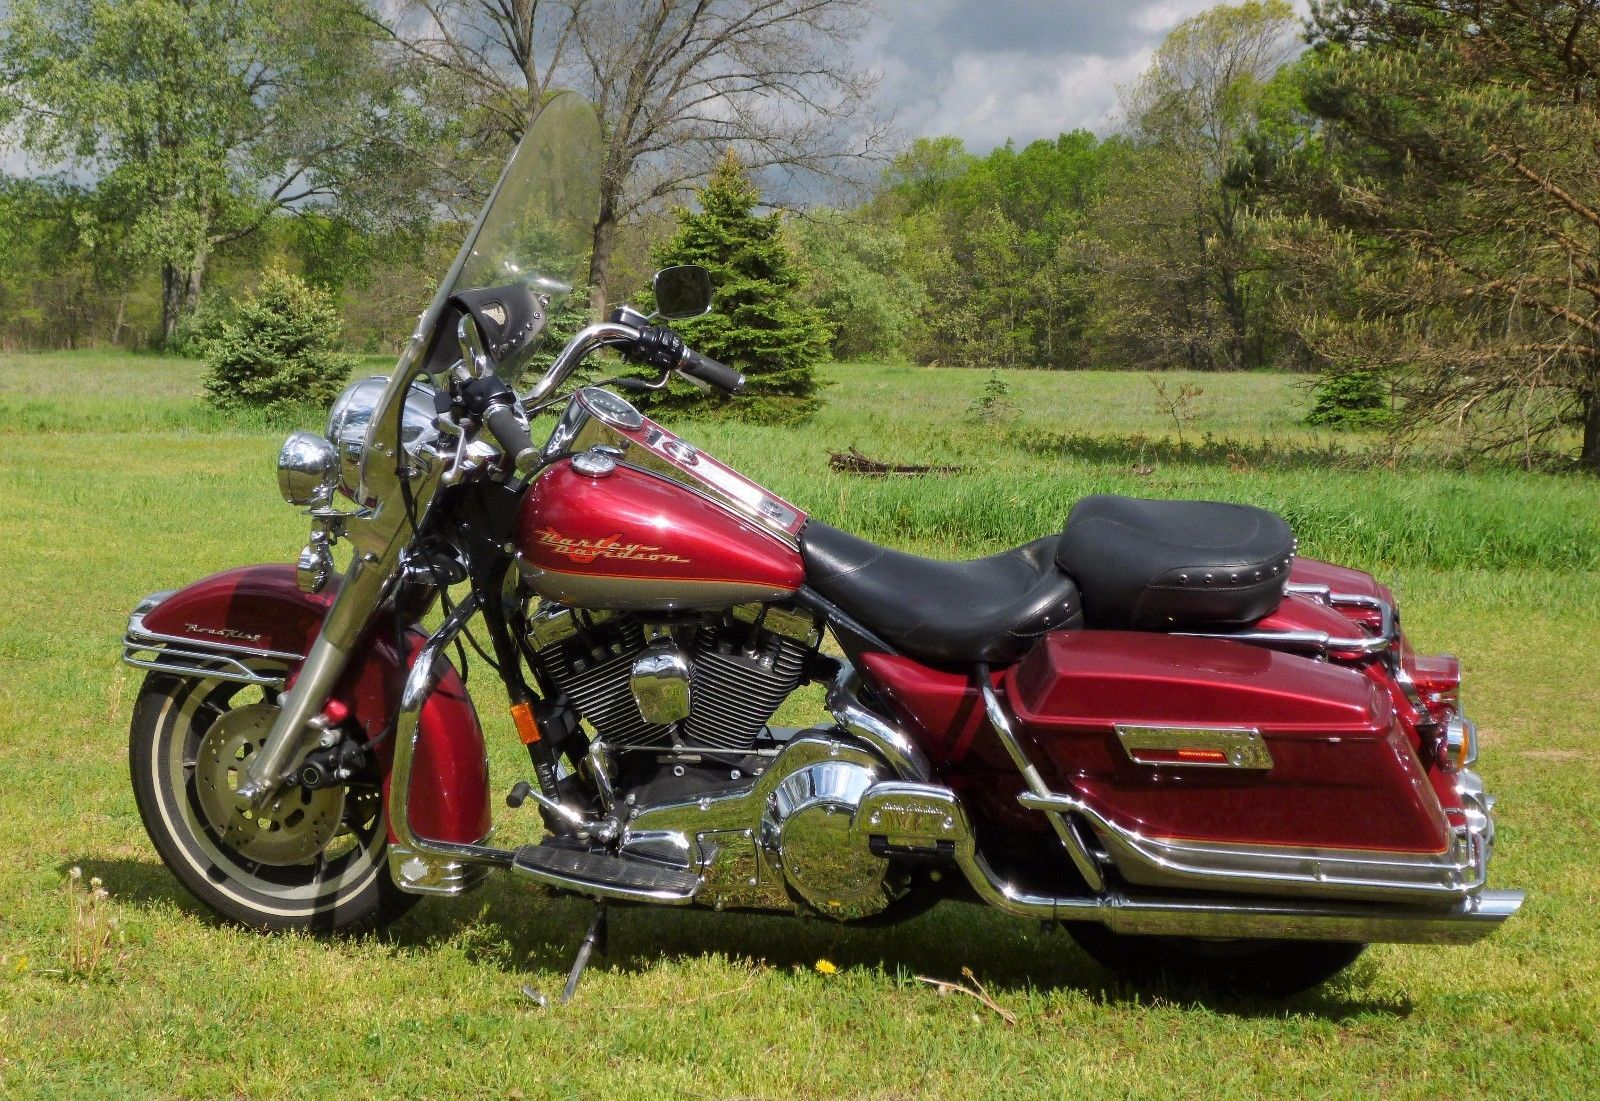 Ebay 1997 Harley Davidson Touring Road King Mint Cond Wont